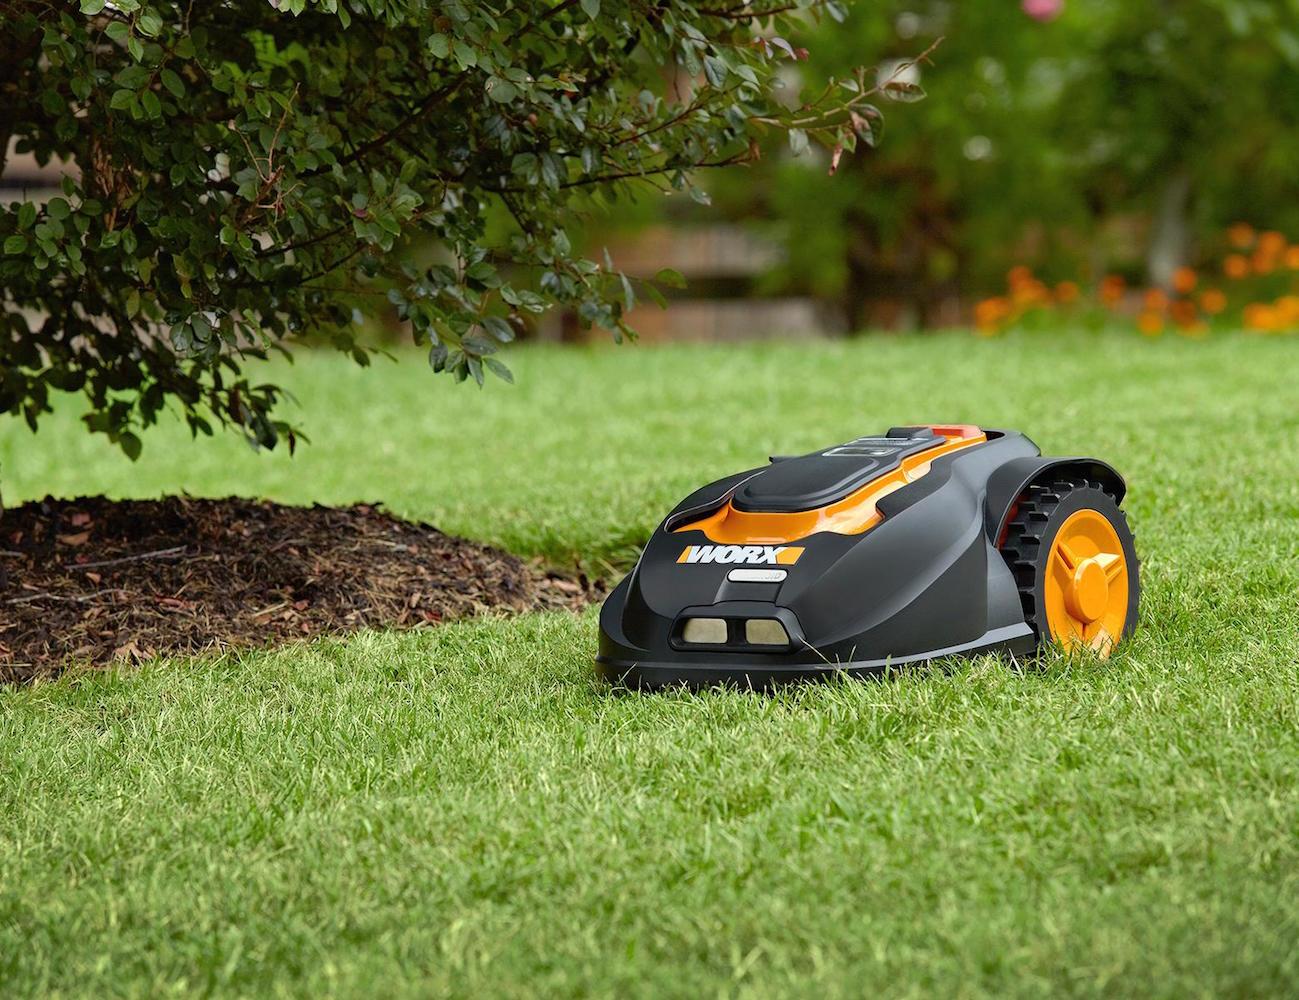 WORX Landroid - Robotic Lawn Mower Review » The Gadget Flow